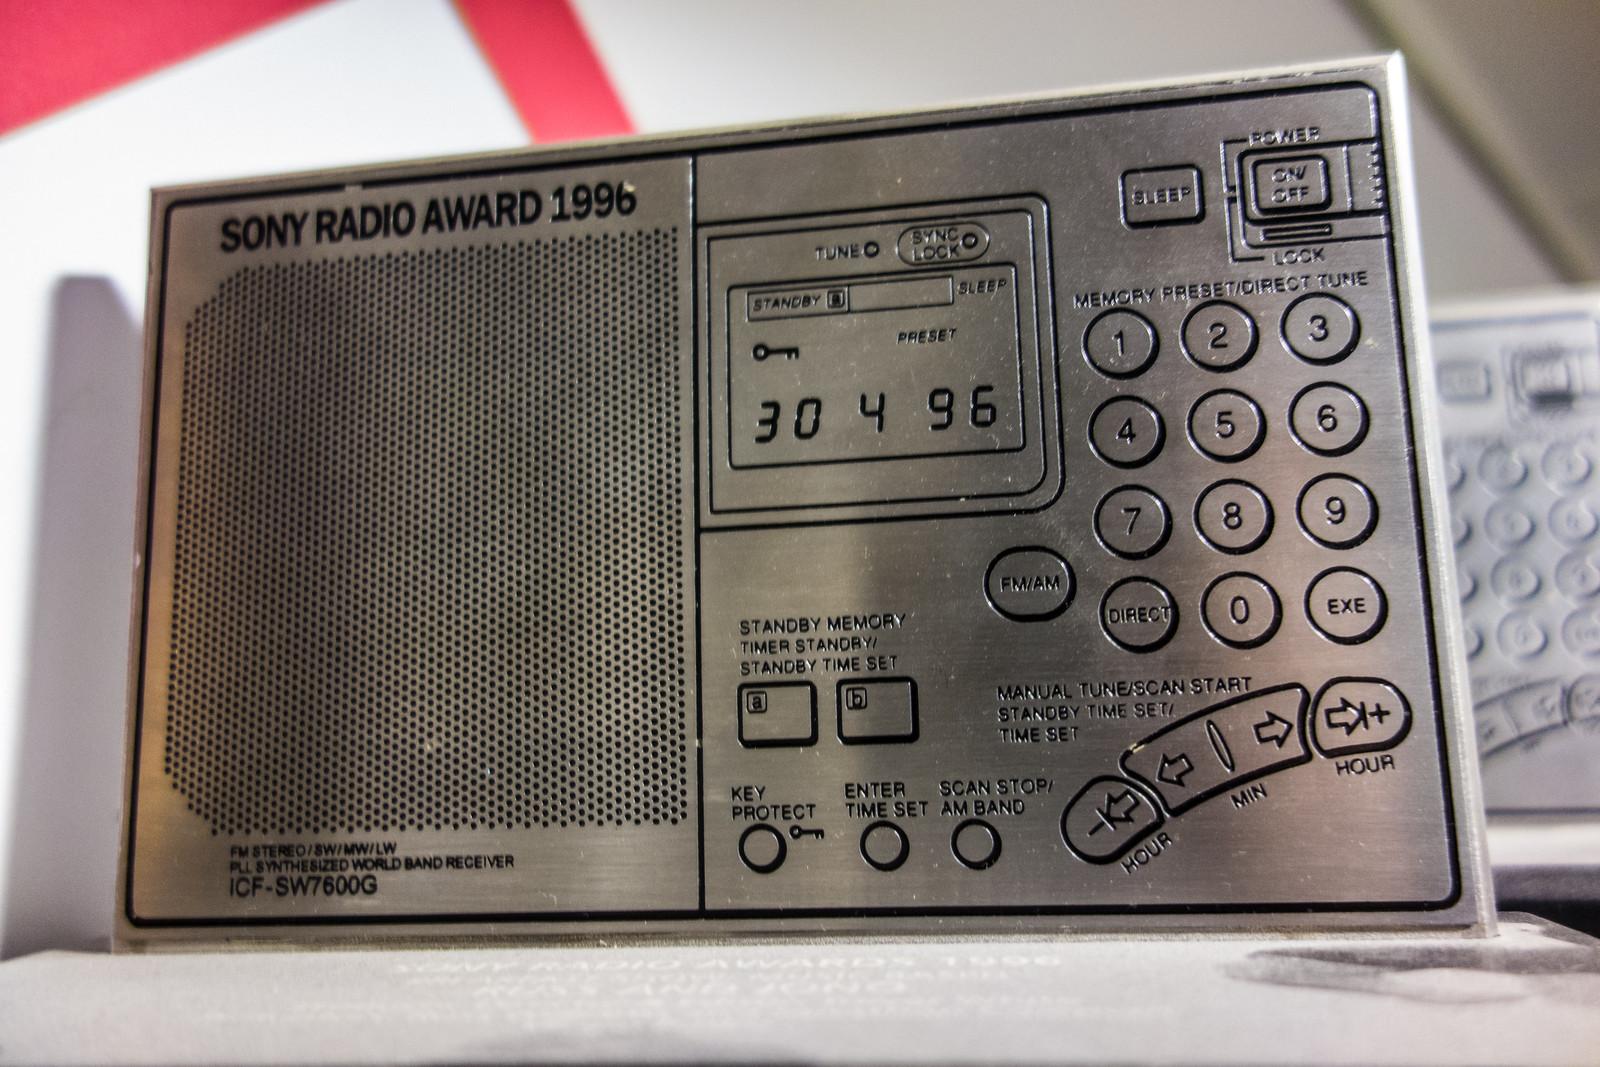 Virgin Radio's First Sony Award